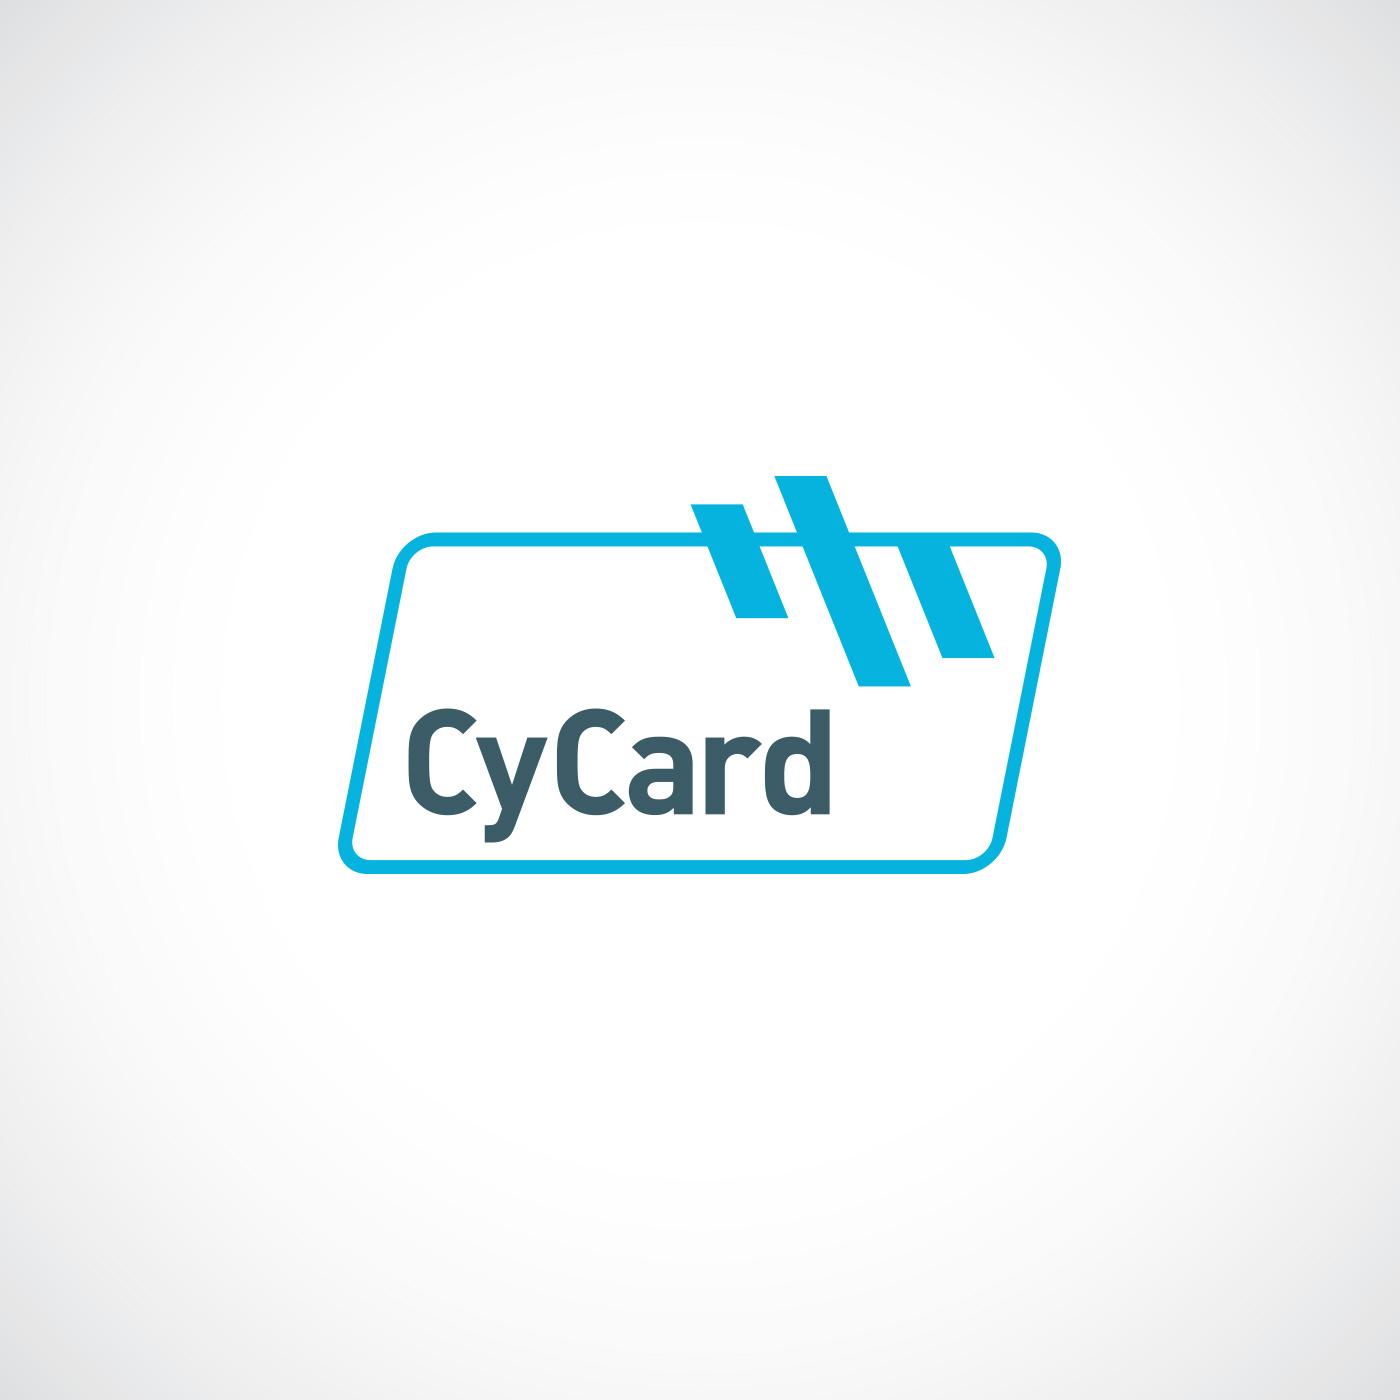 CyCard